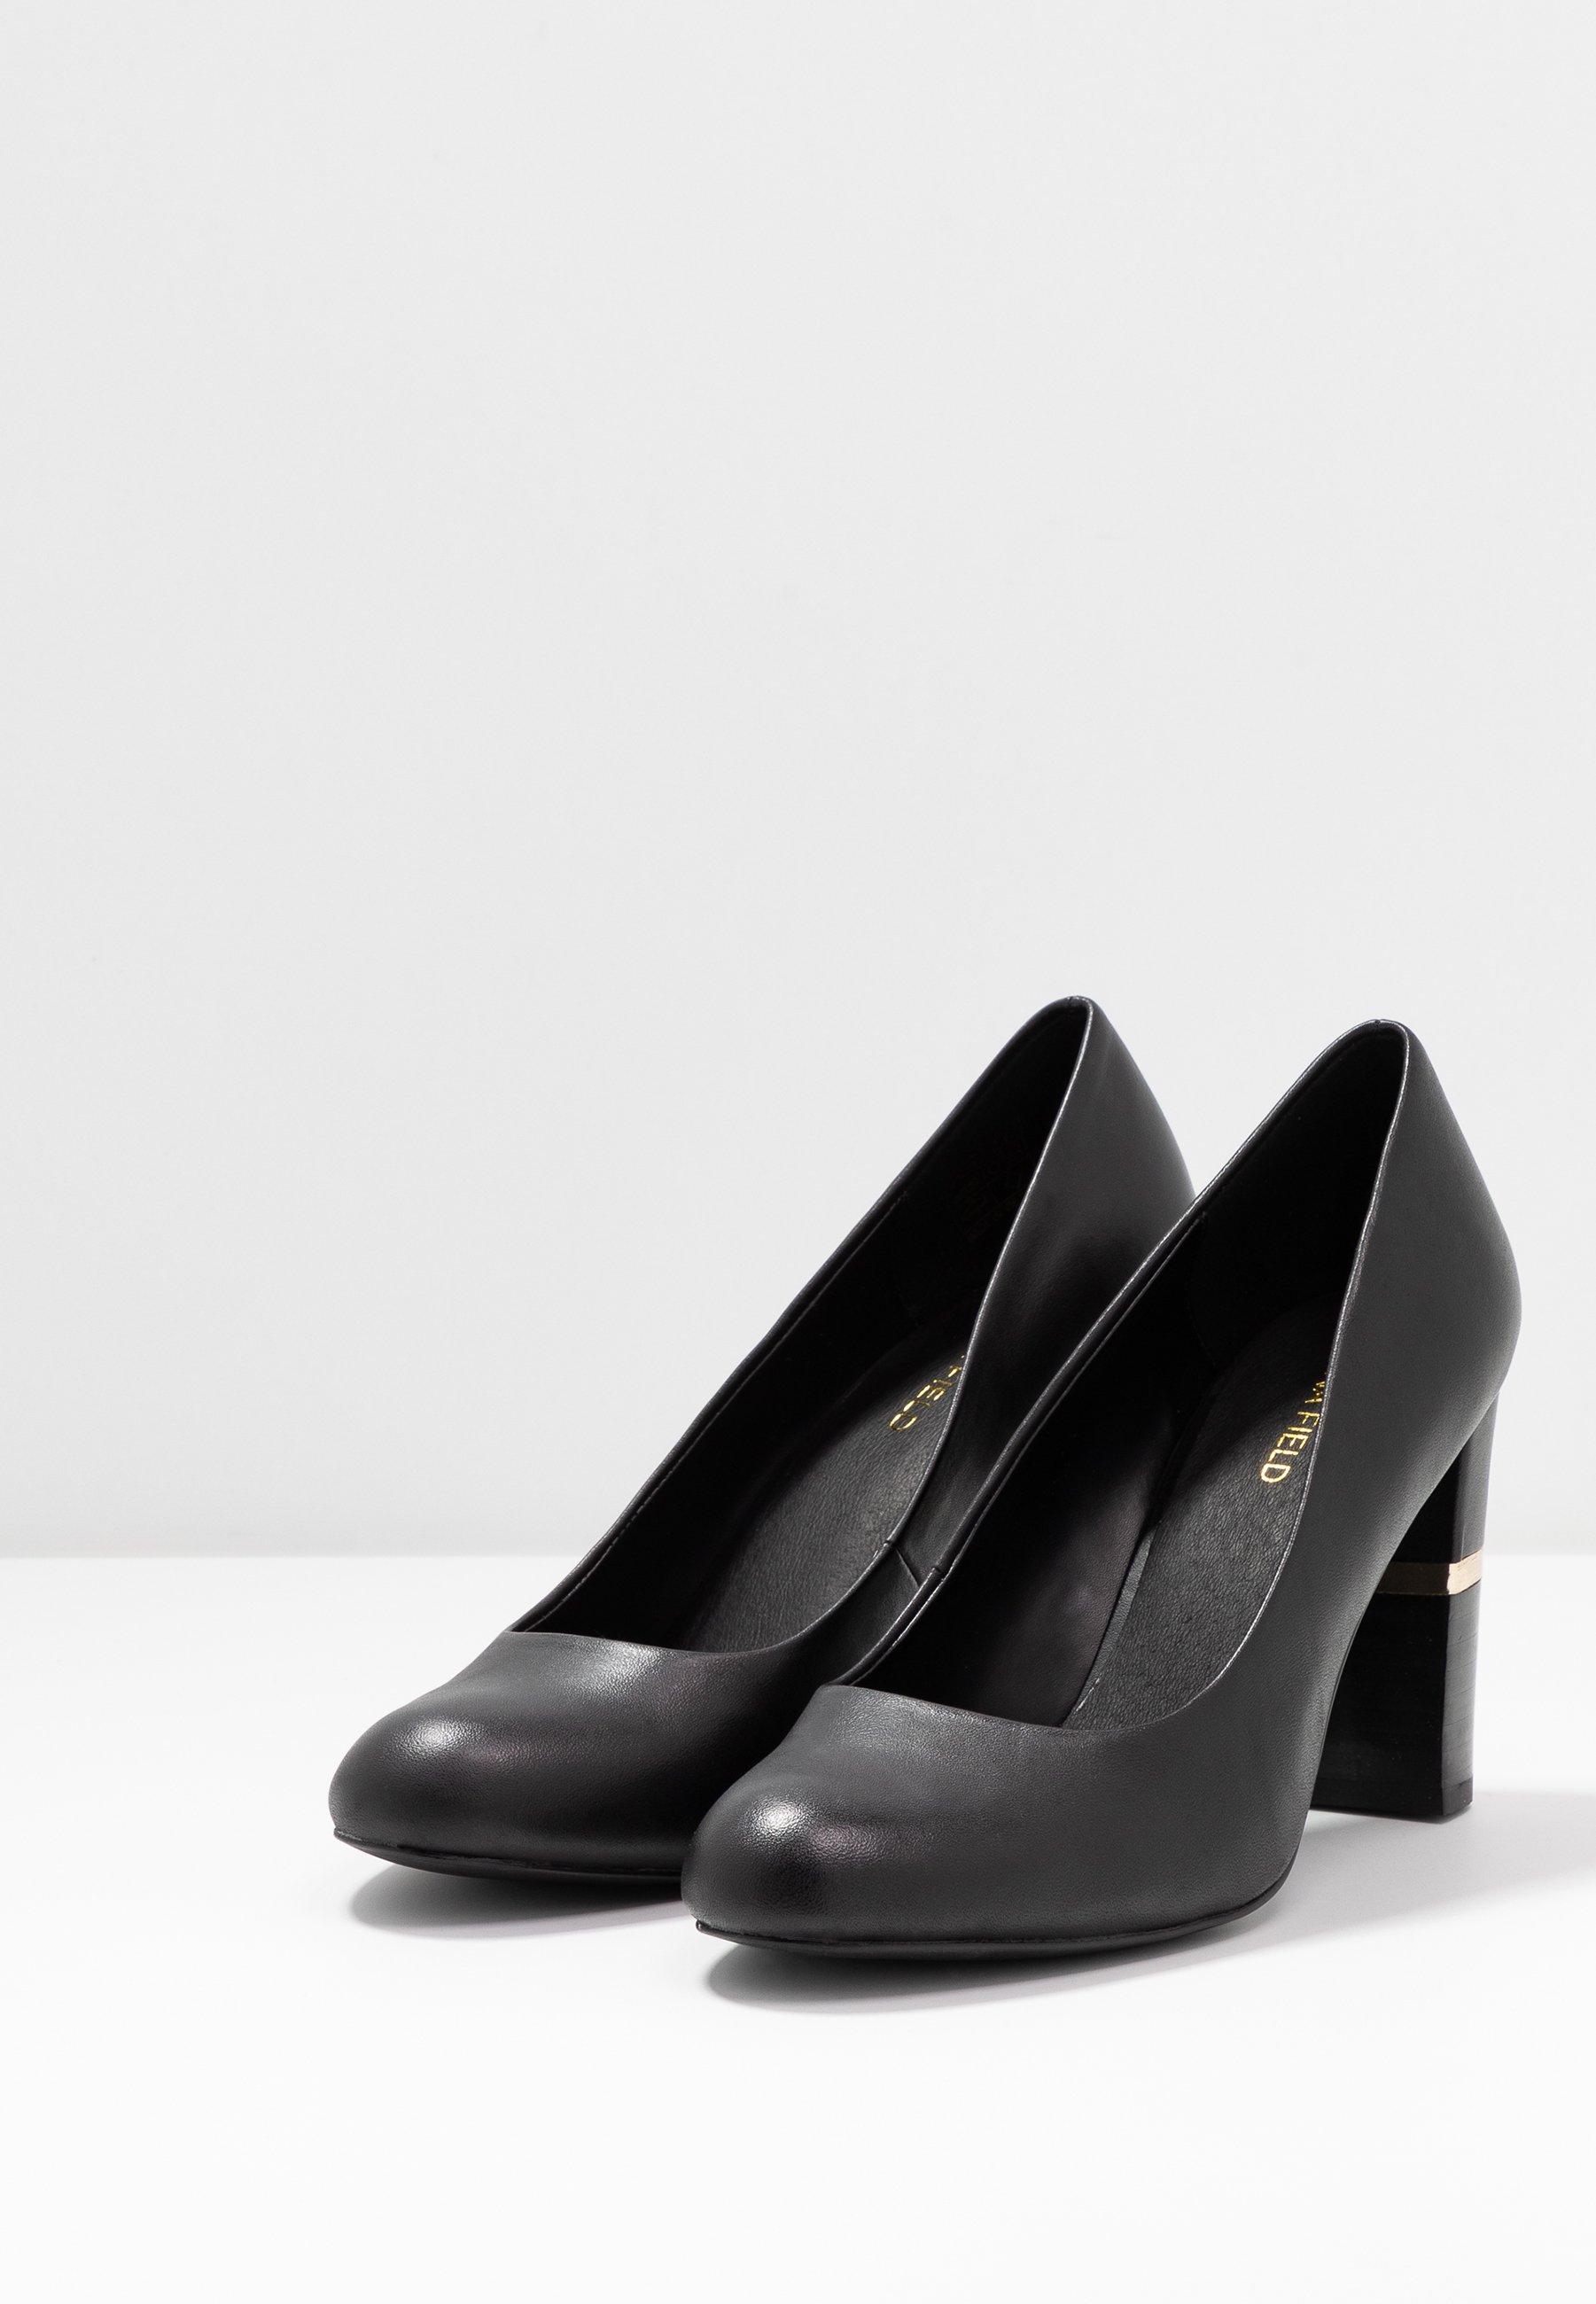 A hoy Anna Field LEATHER PUMPS - Zapatos altos - black | Calzado de mujer2020 bGmyN